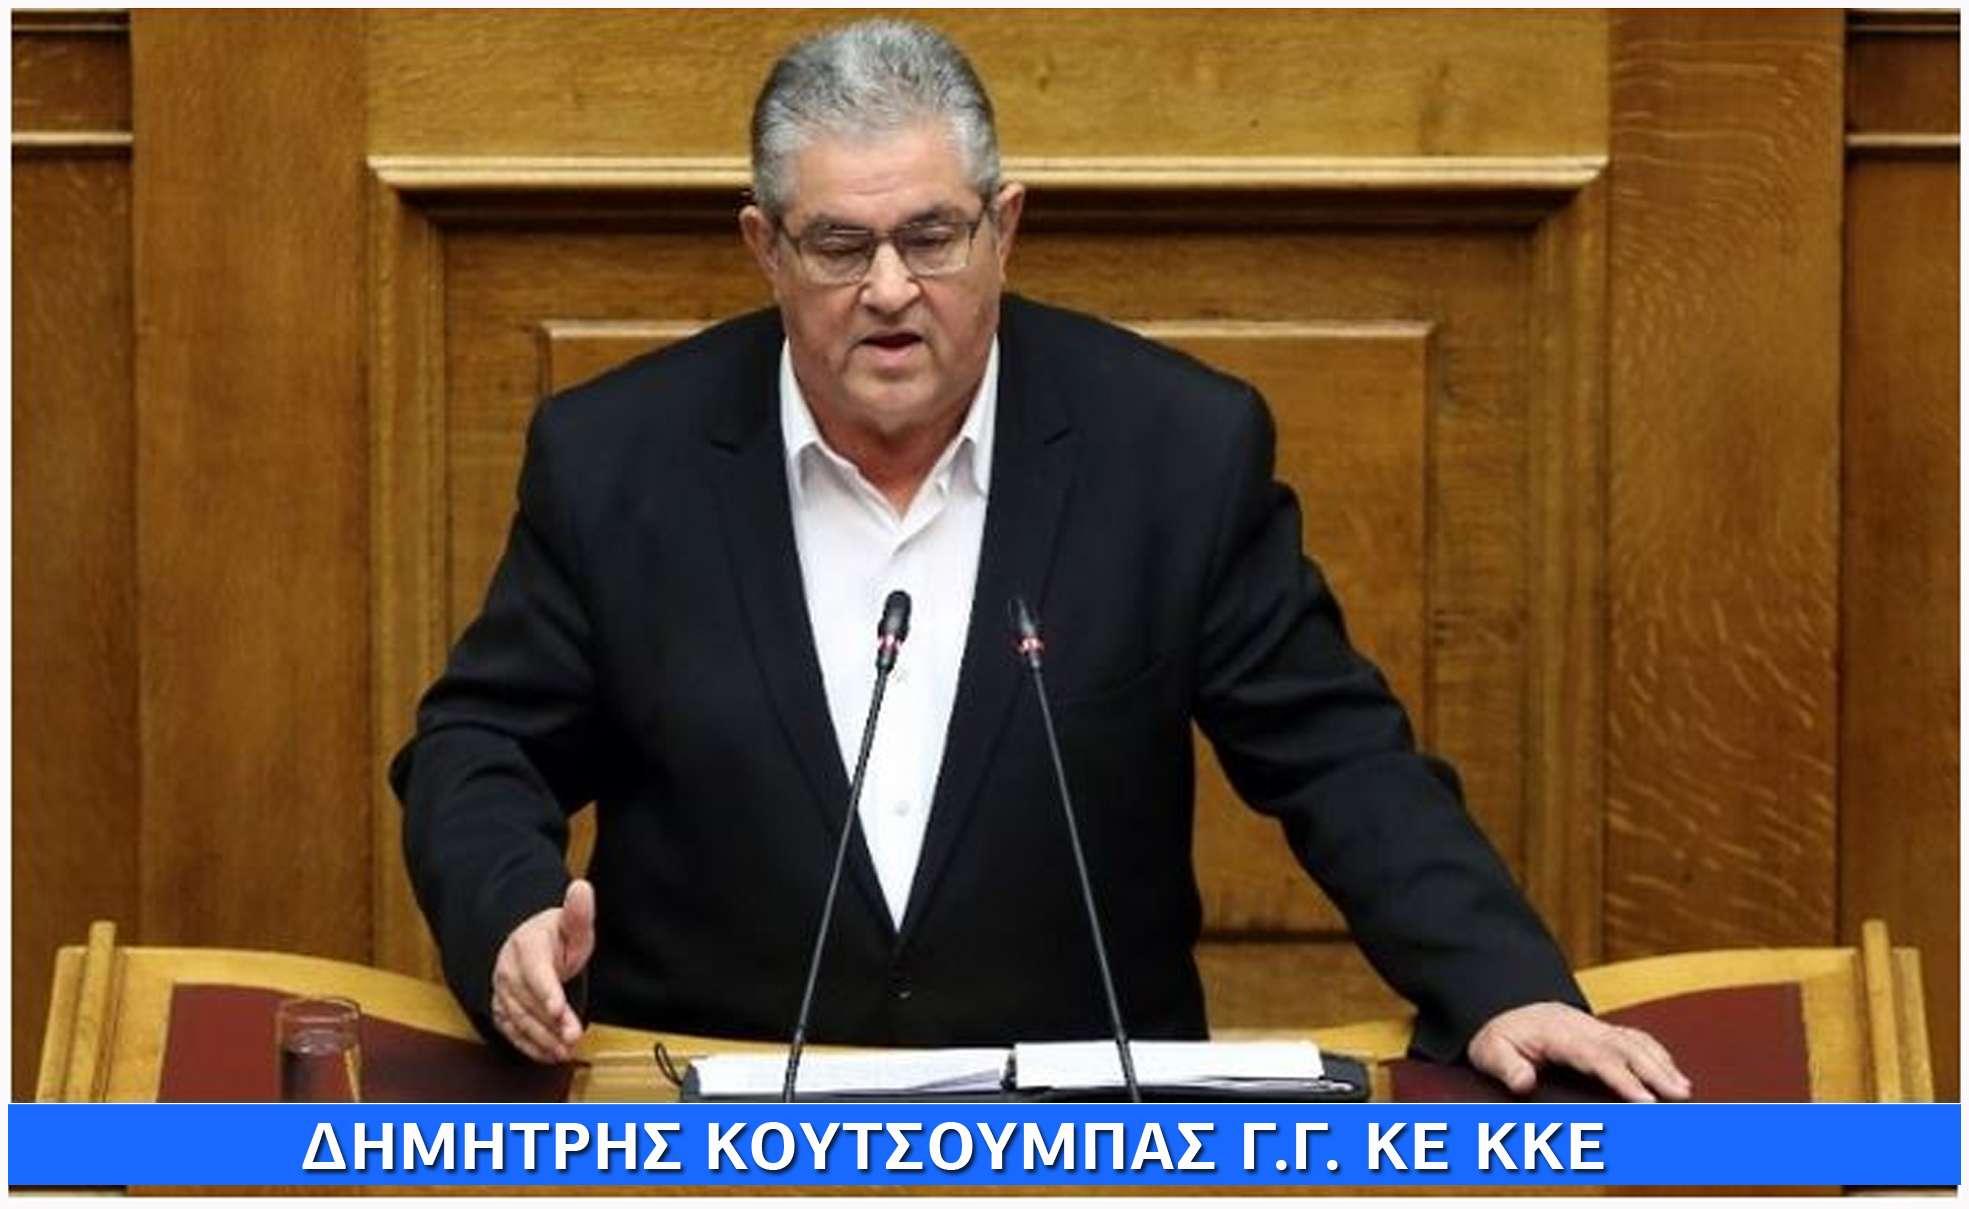 Vouli ΒΟΥΛΗ Δ ΚΟΥΤΣΟΥΜΠΑΣ KOYTSOUBAS